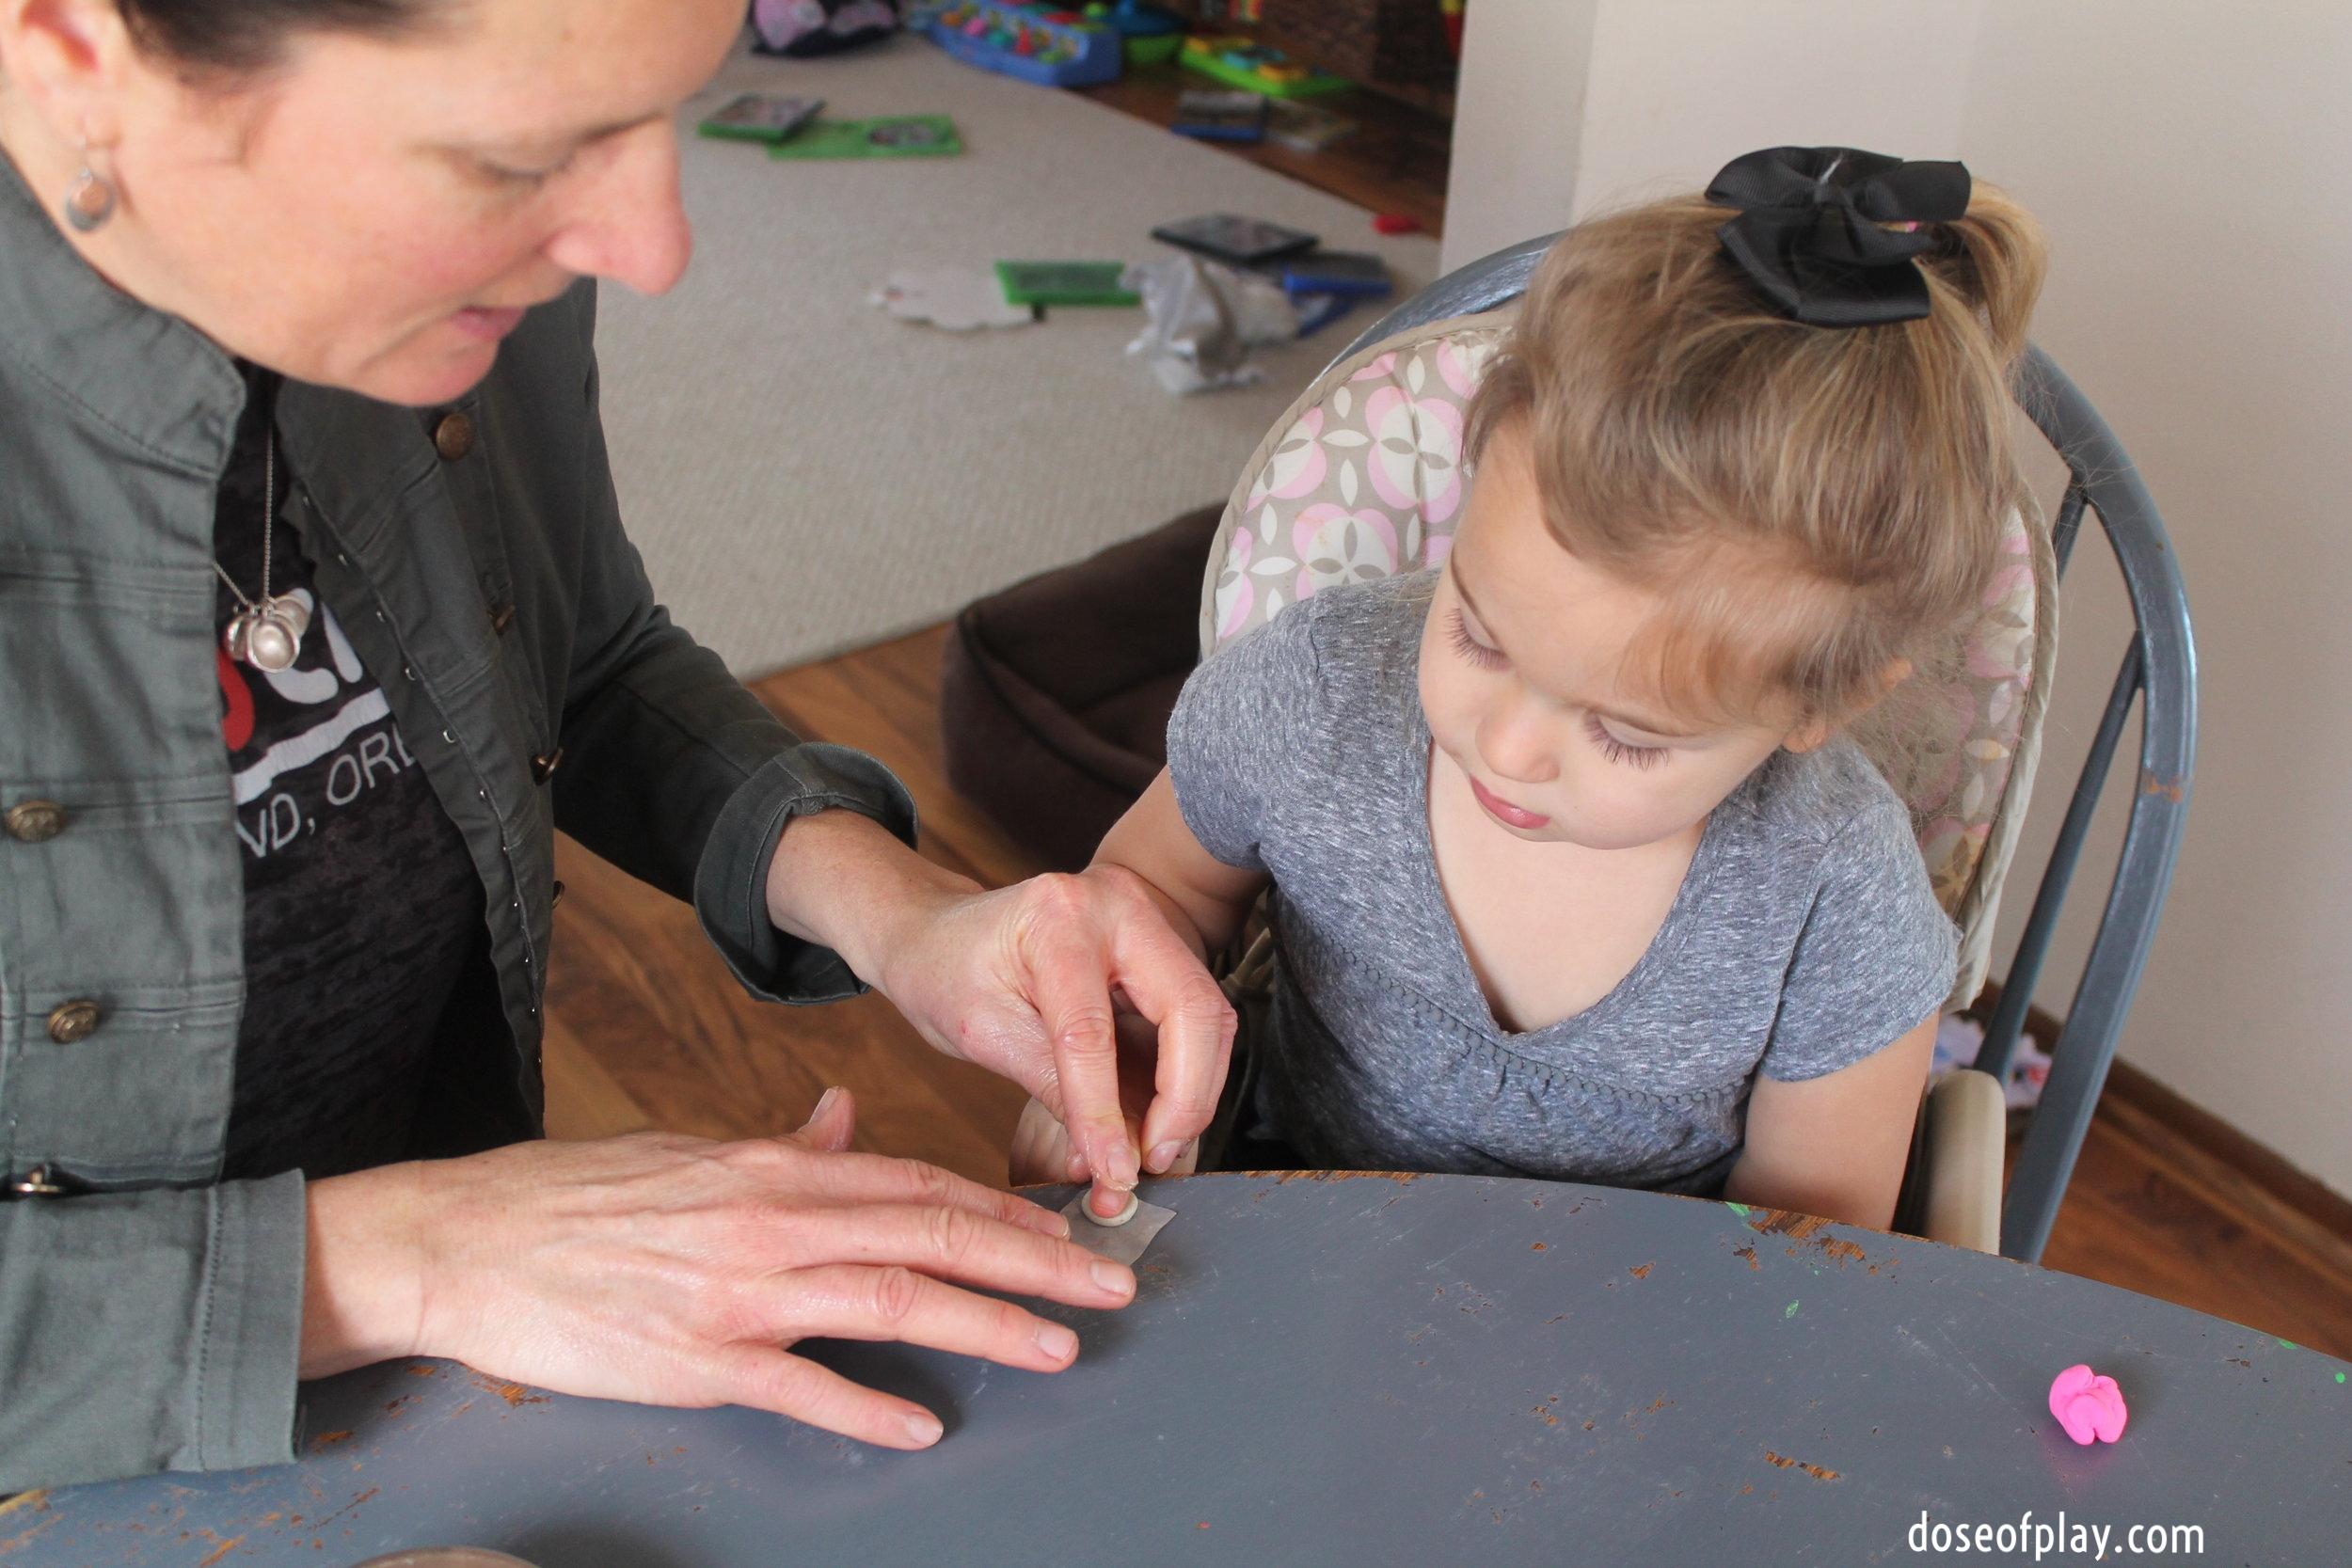 Making the fingerprint impression